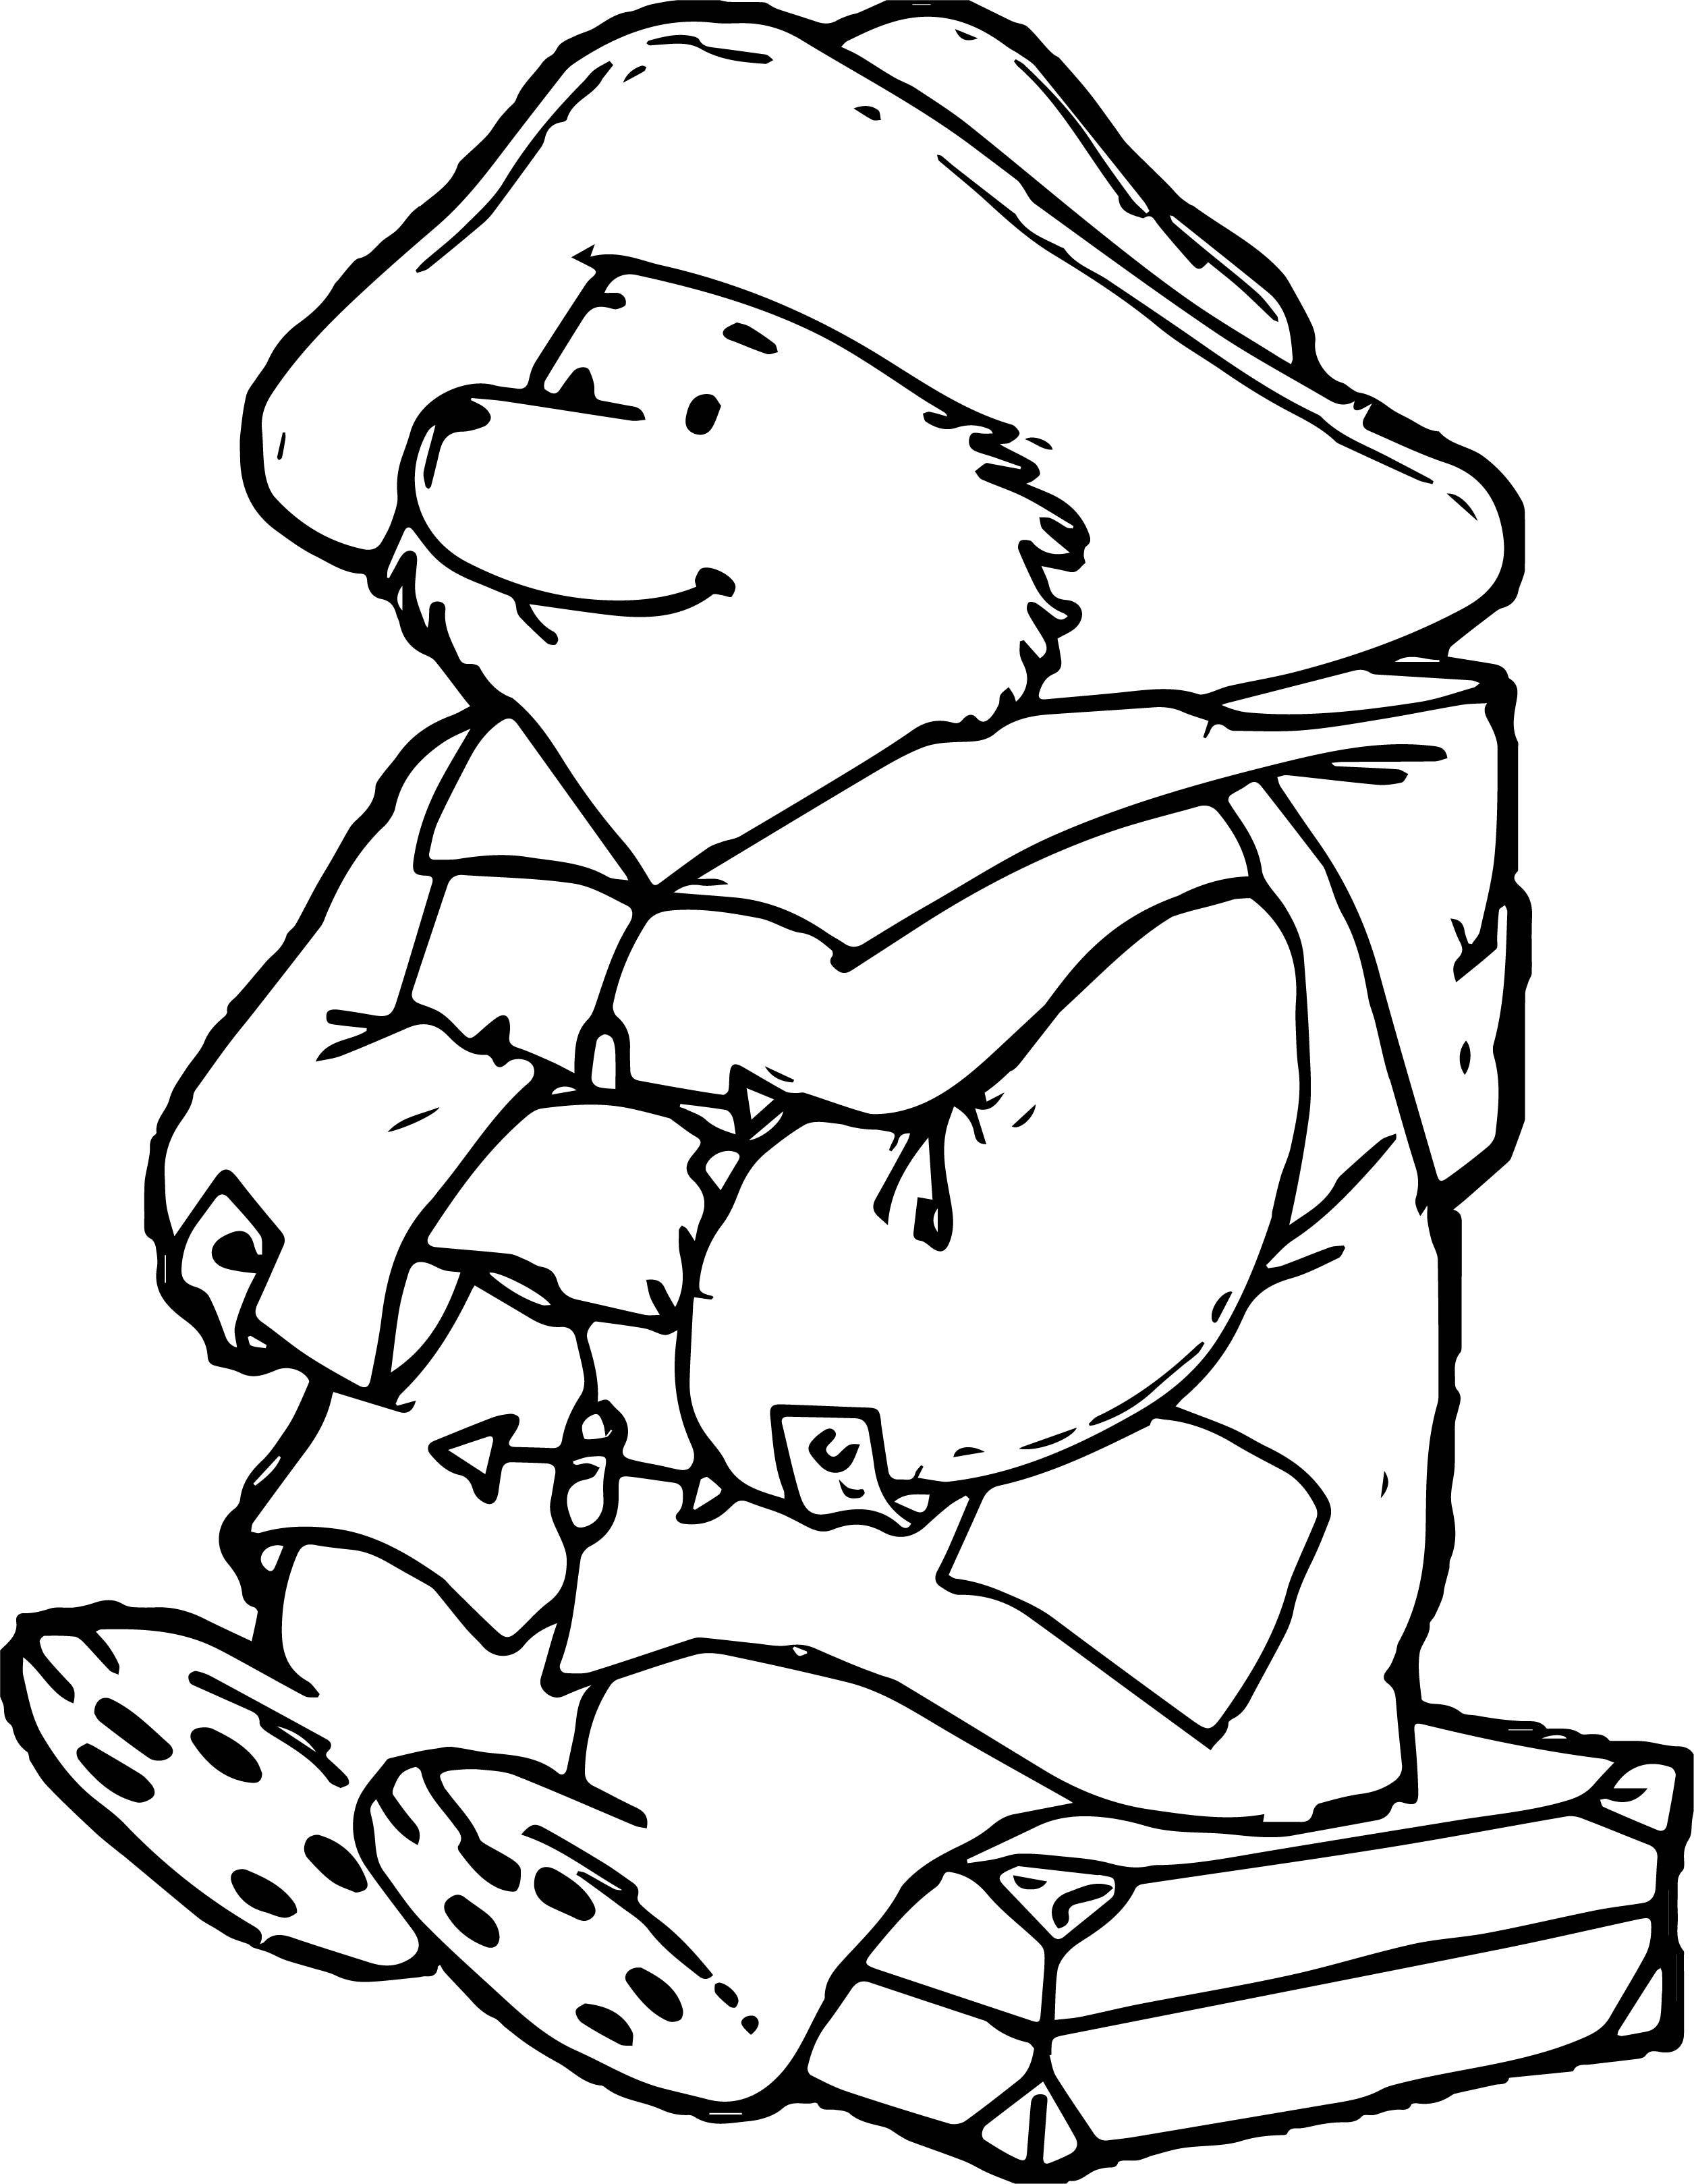 Nice Large Bear Coloring Page Bear Coloring Pages Largest Bear Paddington Bear